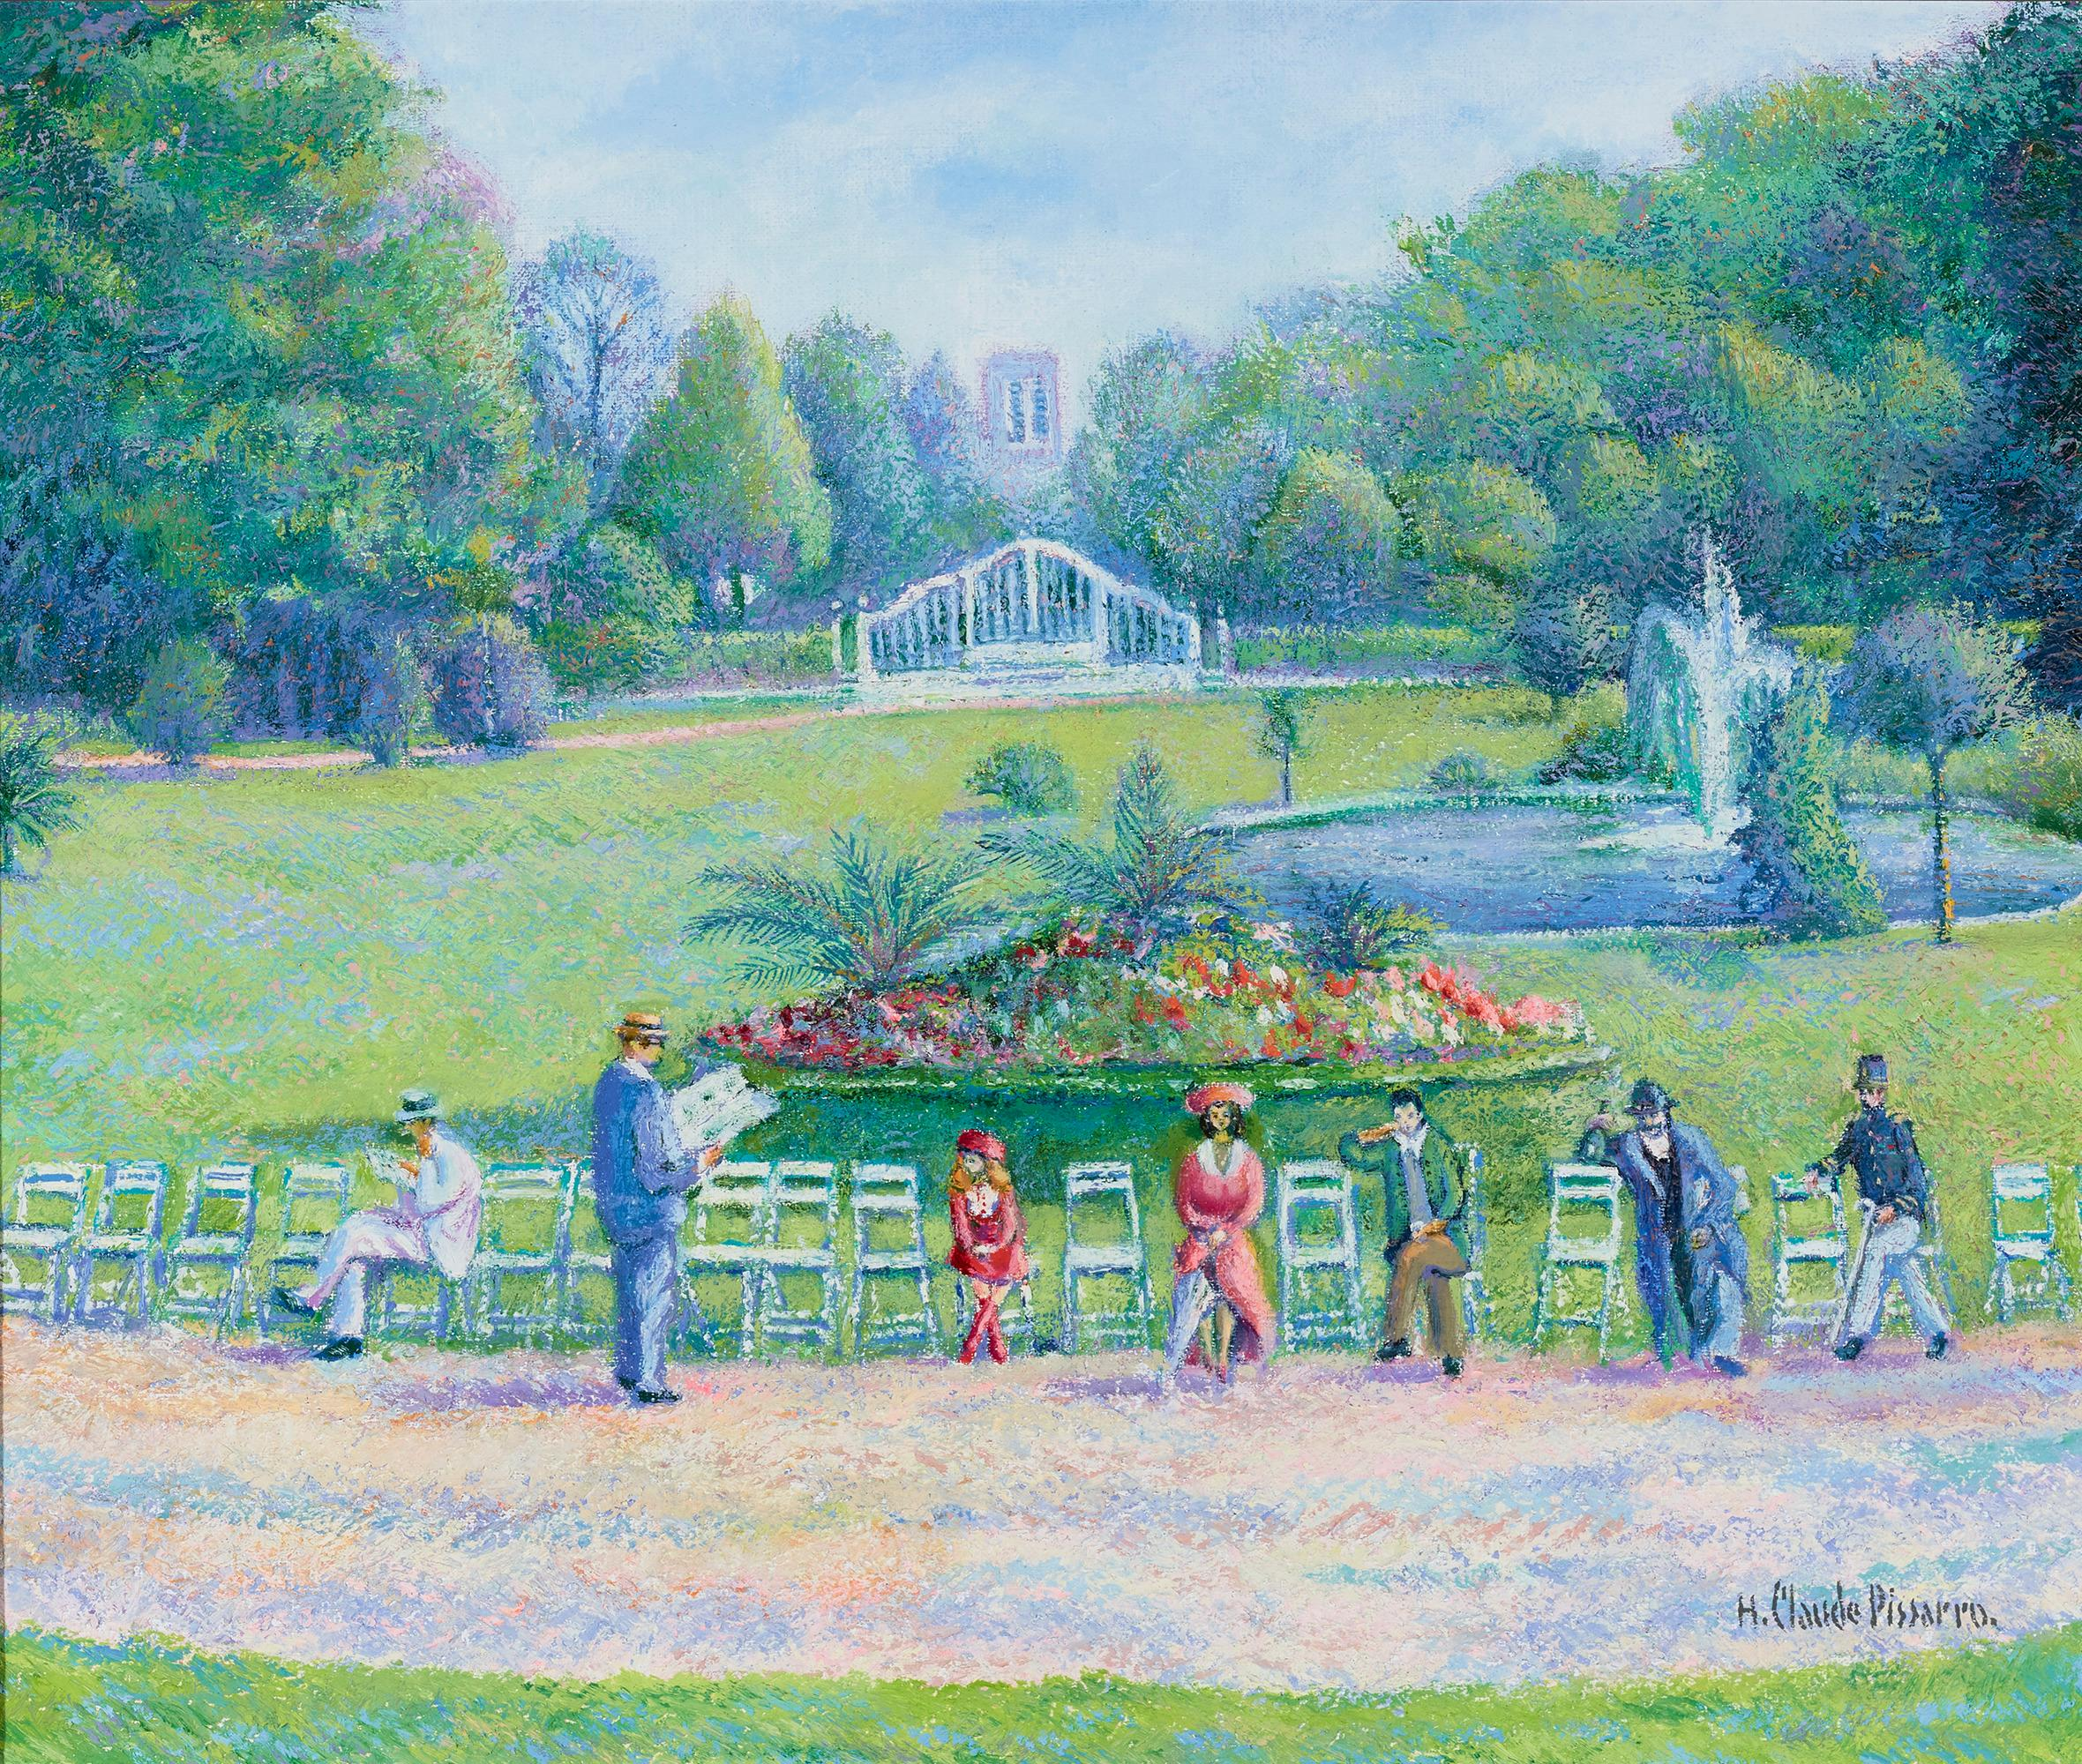 Sieste au jardin public (Rest in the Public Garden)